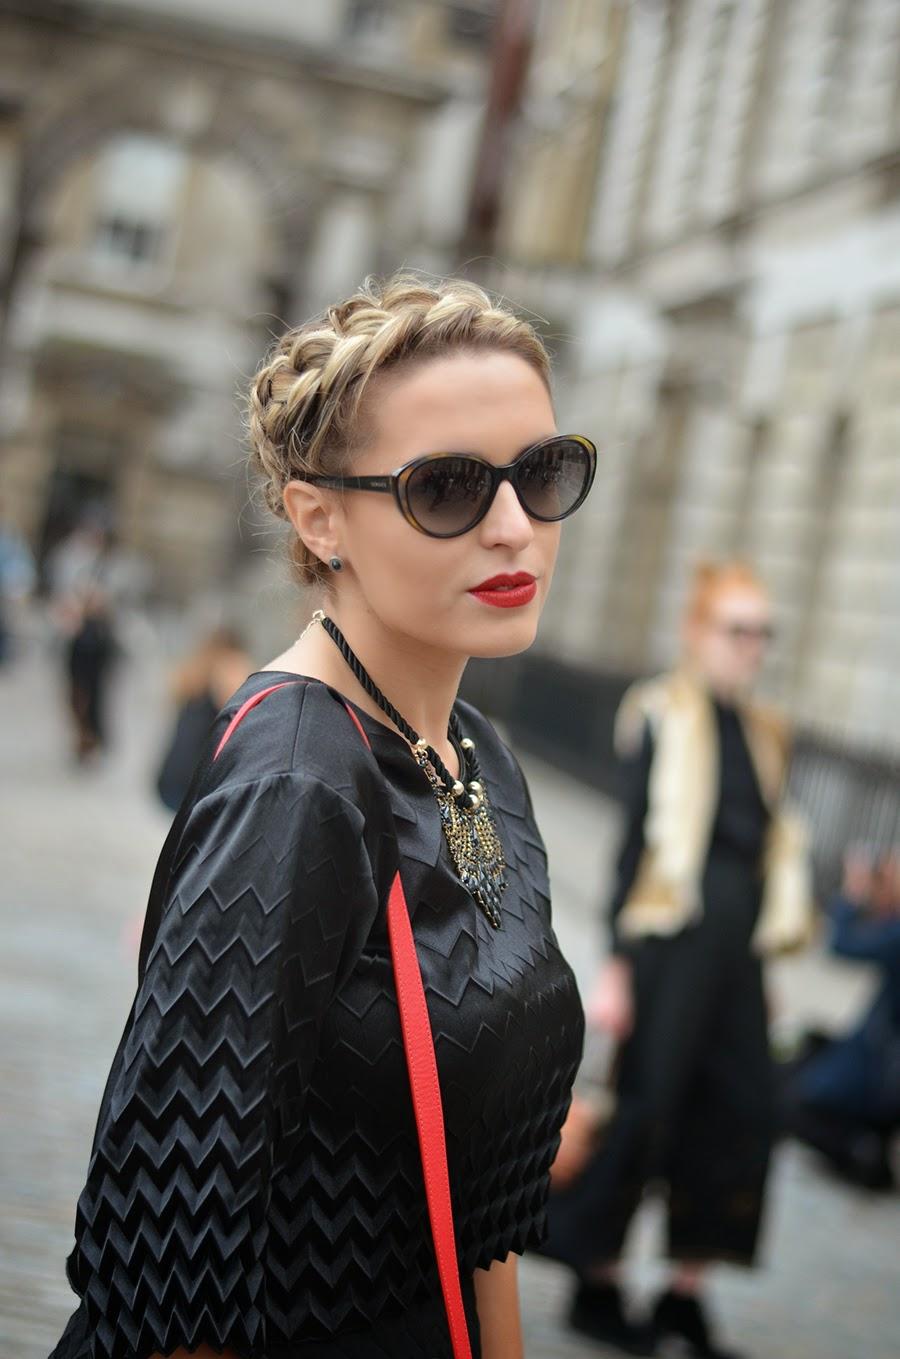 georgia hardinge, lfw, street style lfw, best lfw, london fashion week, ss15, mules